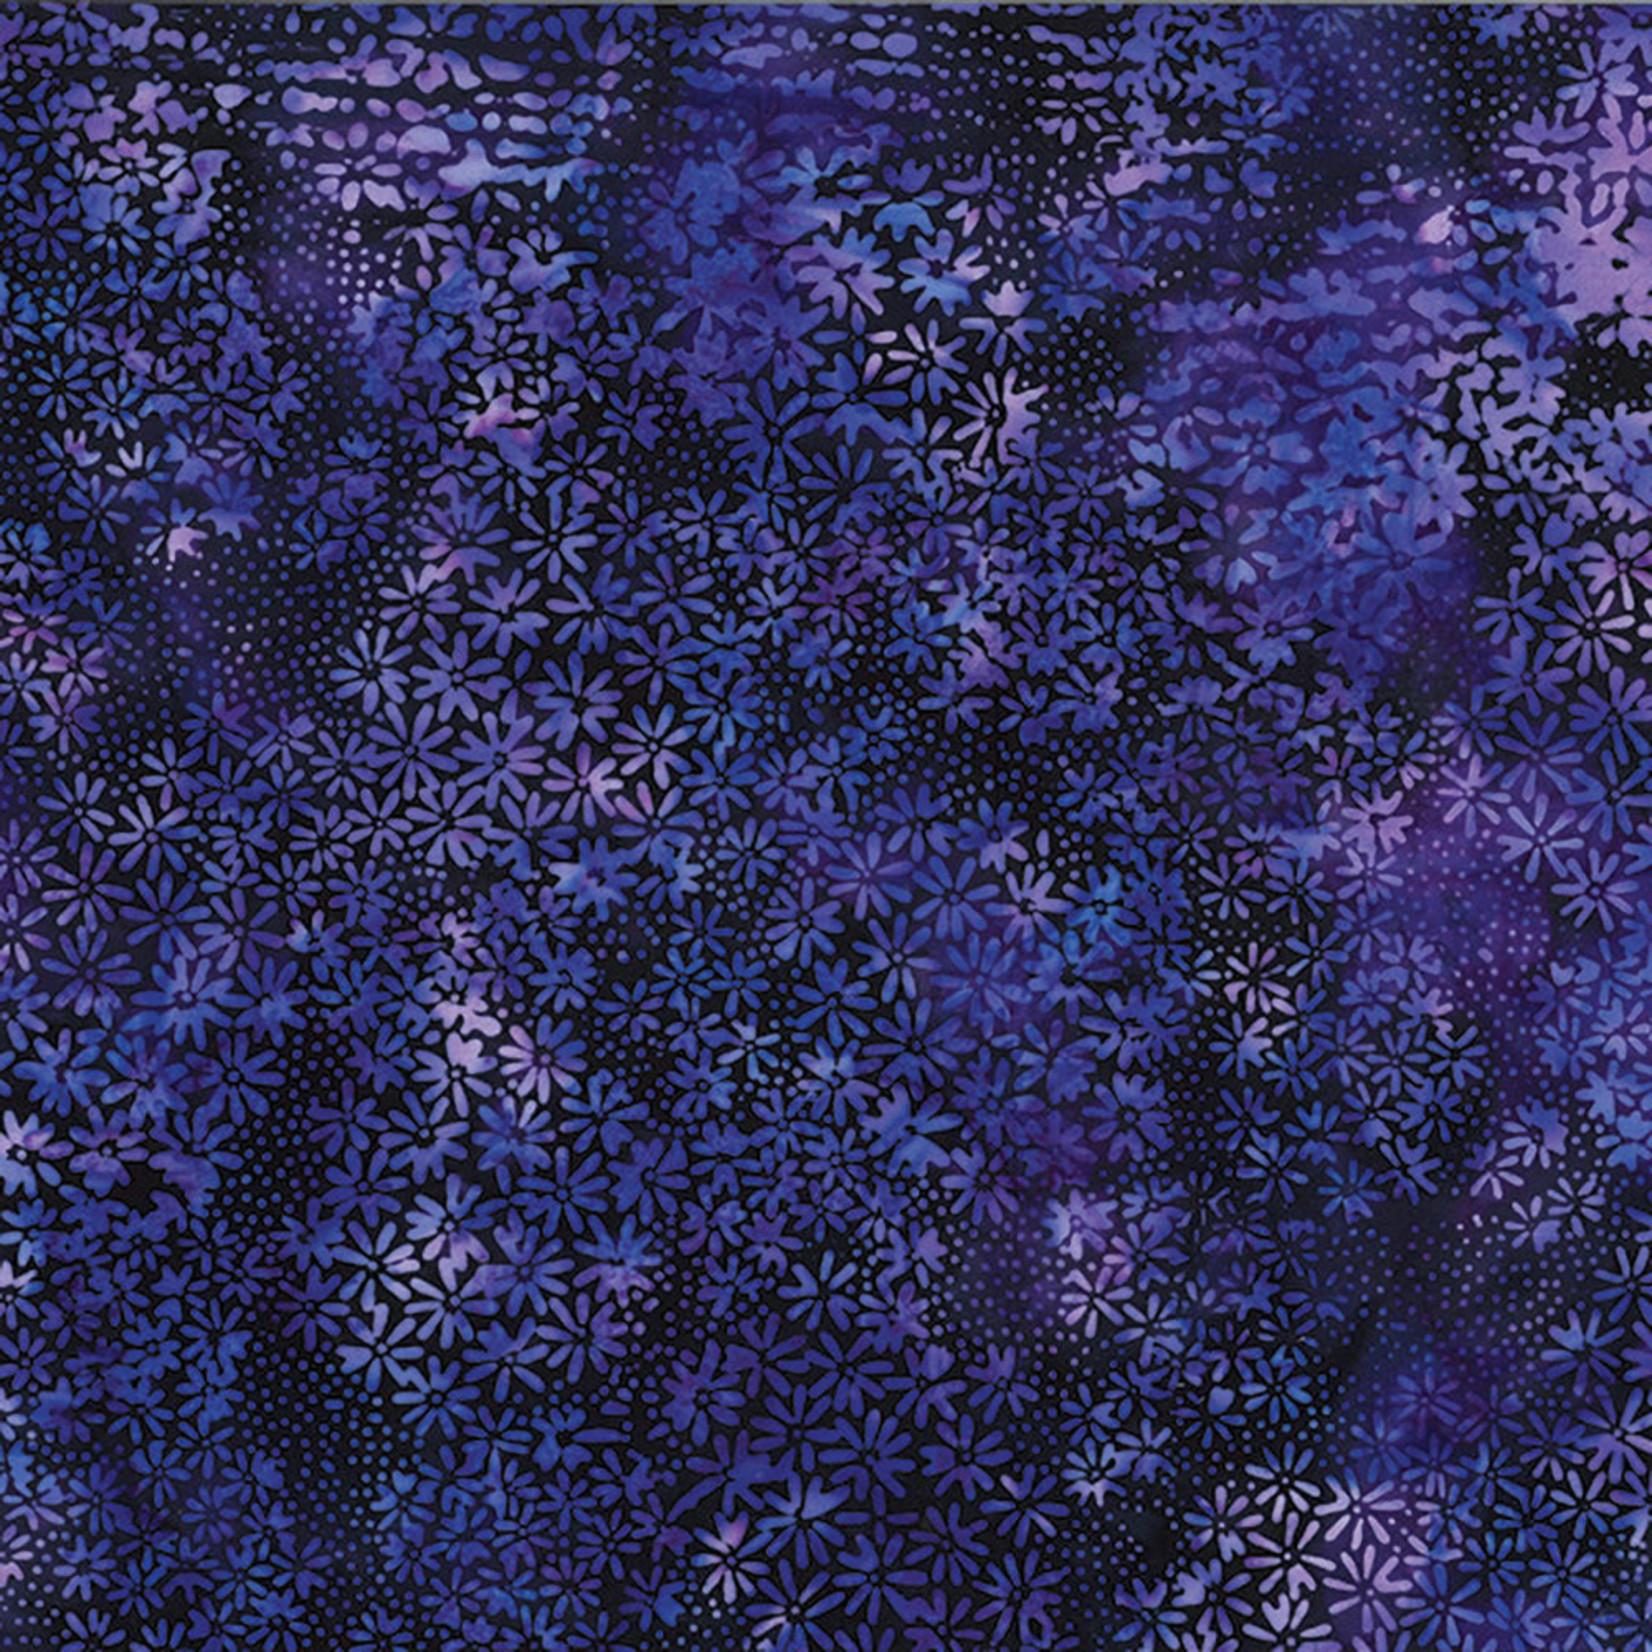 Hoffman Fabrics Bali Batik Daisys & Dots - Purple